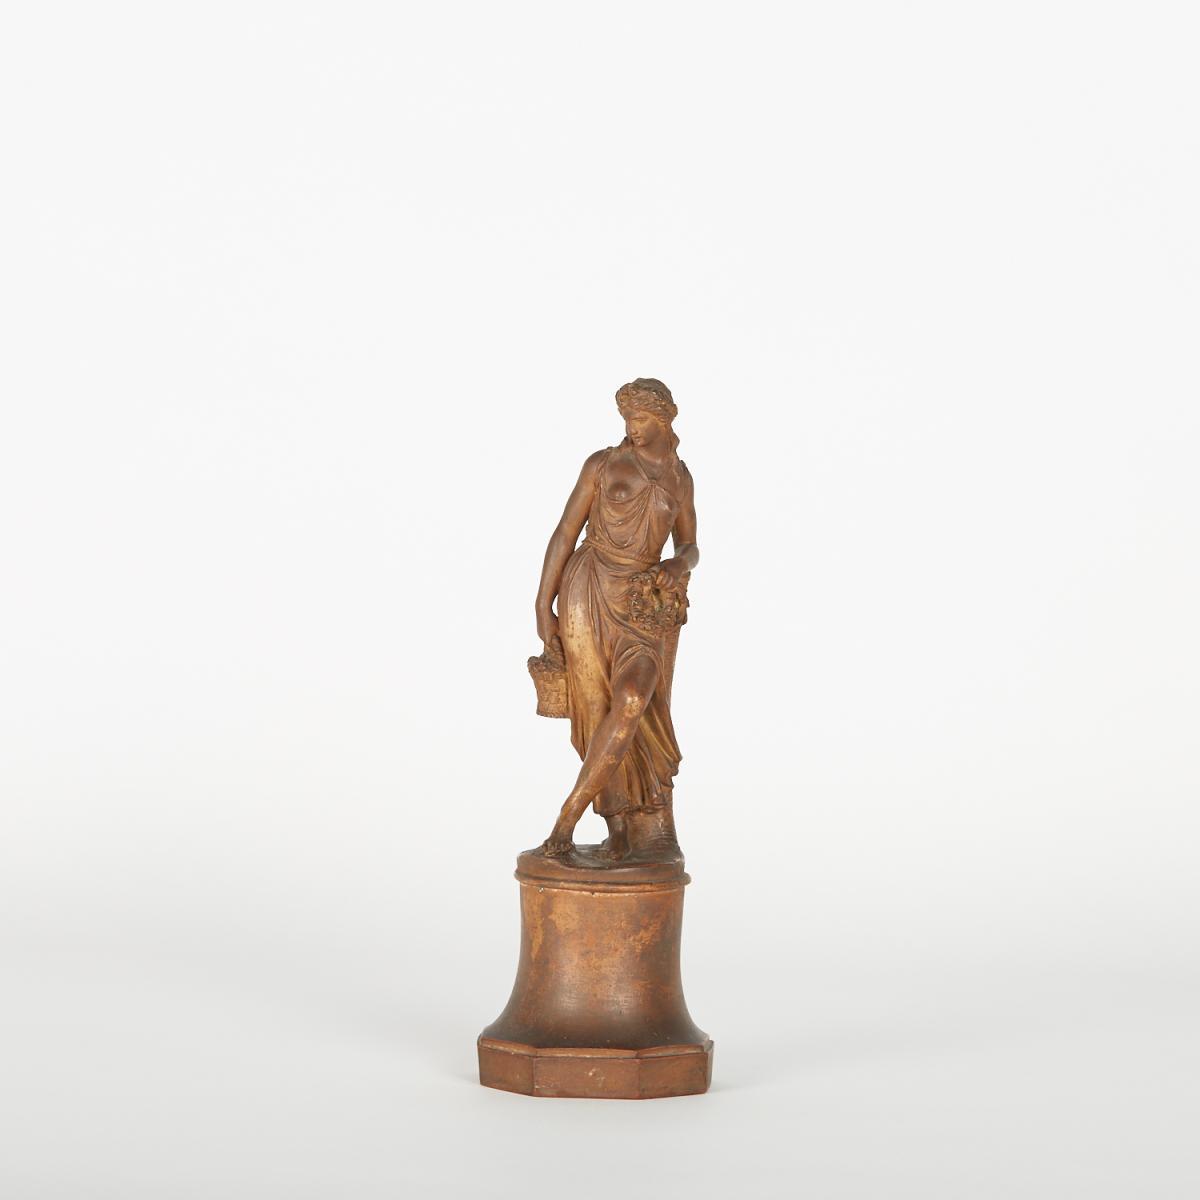 Terre Cuite, Femme à l'Antique, XVIIIe